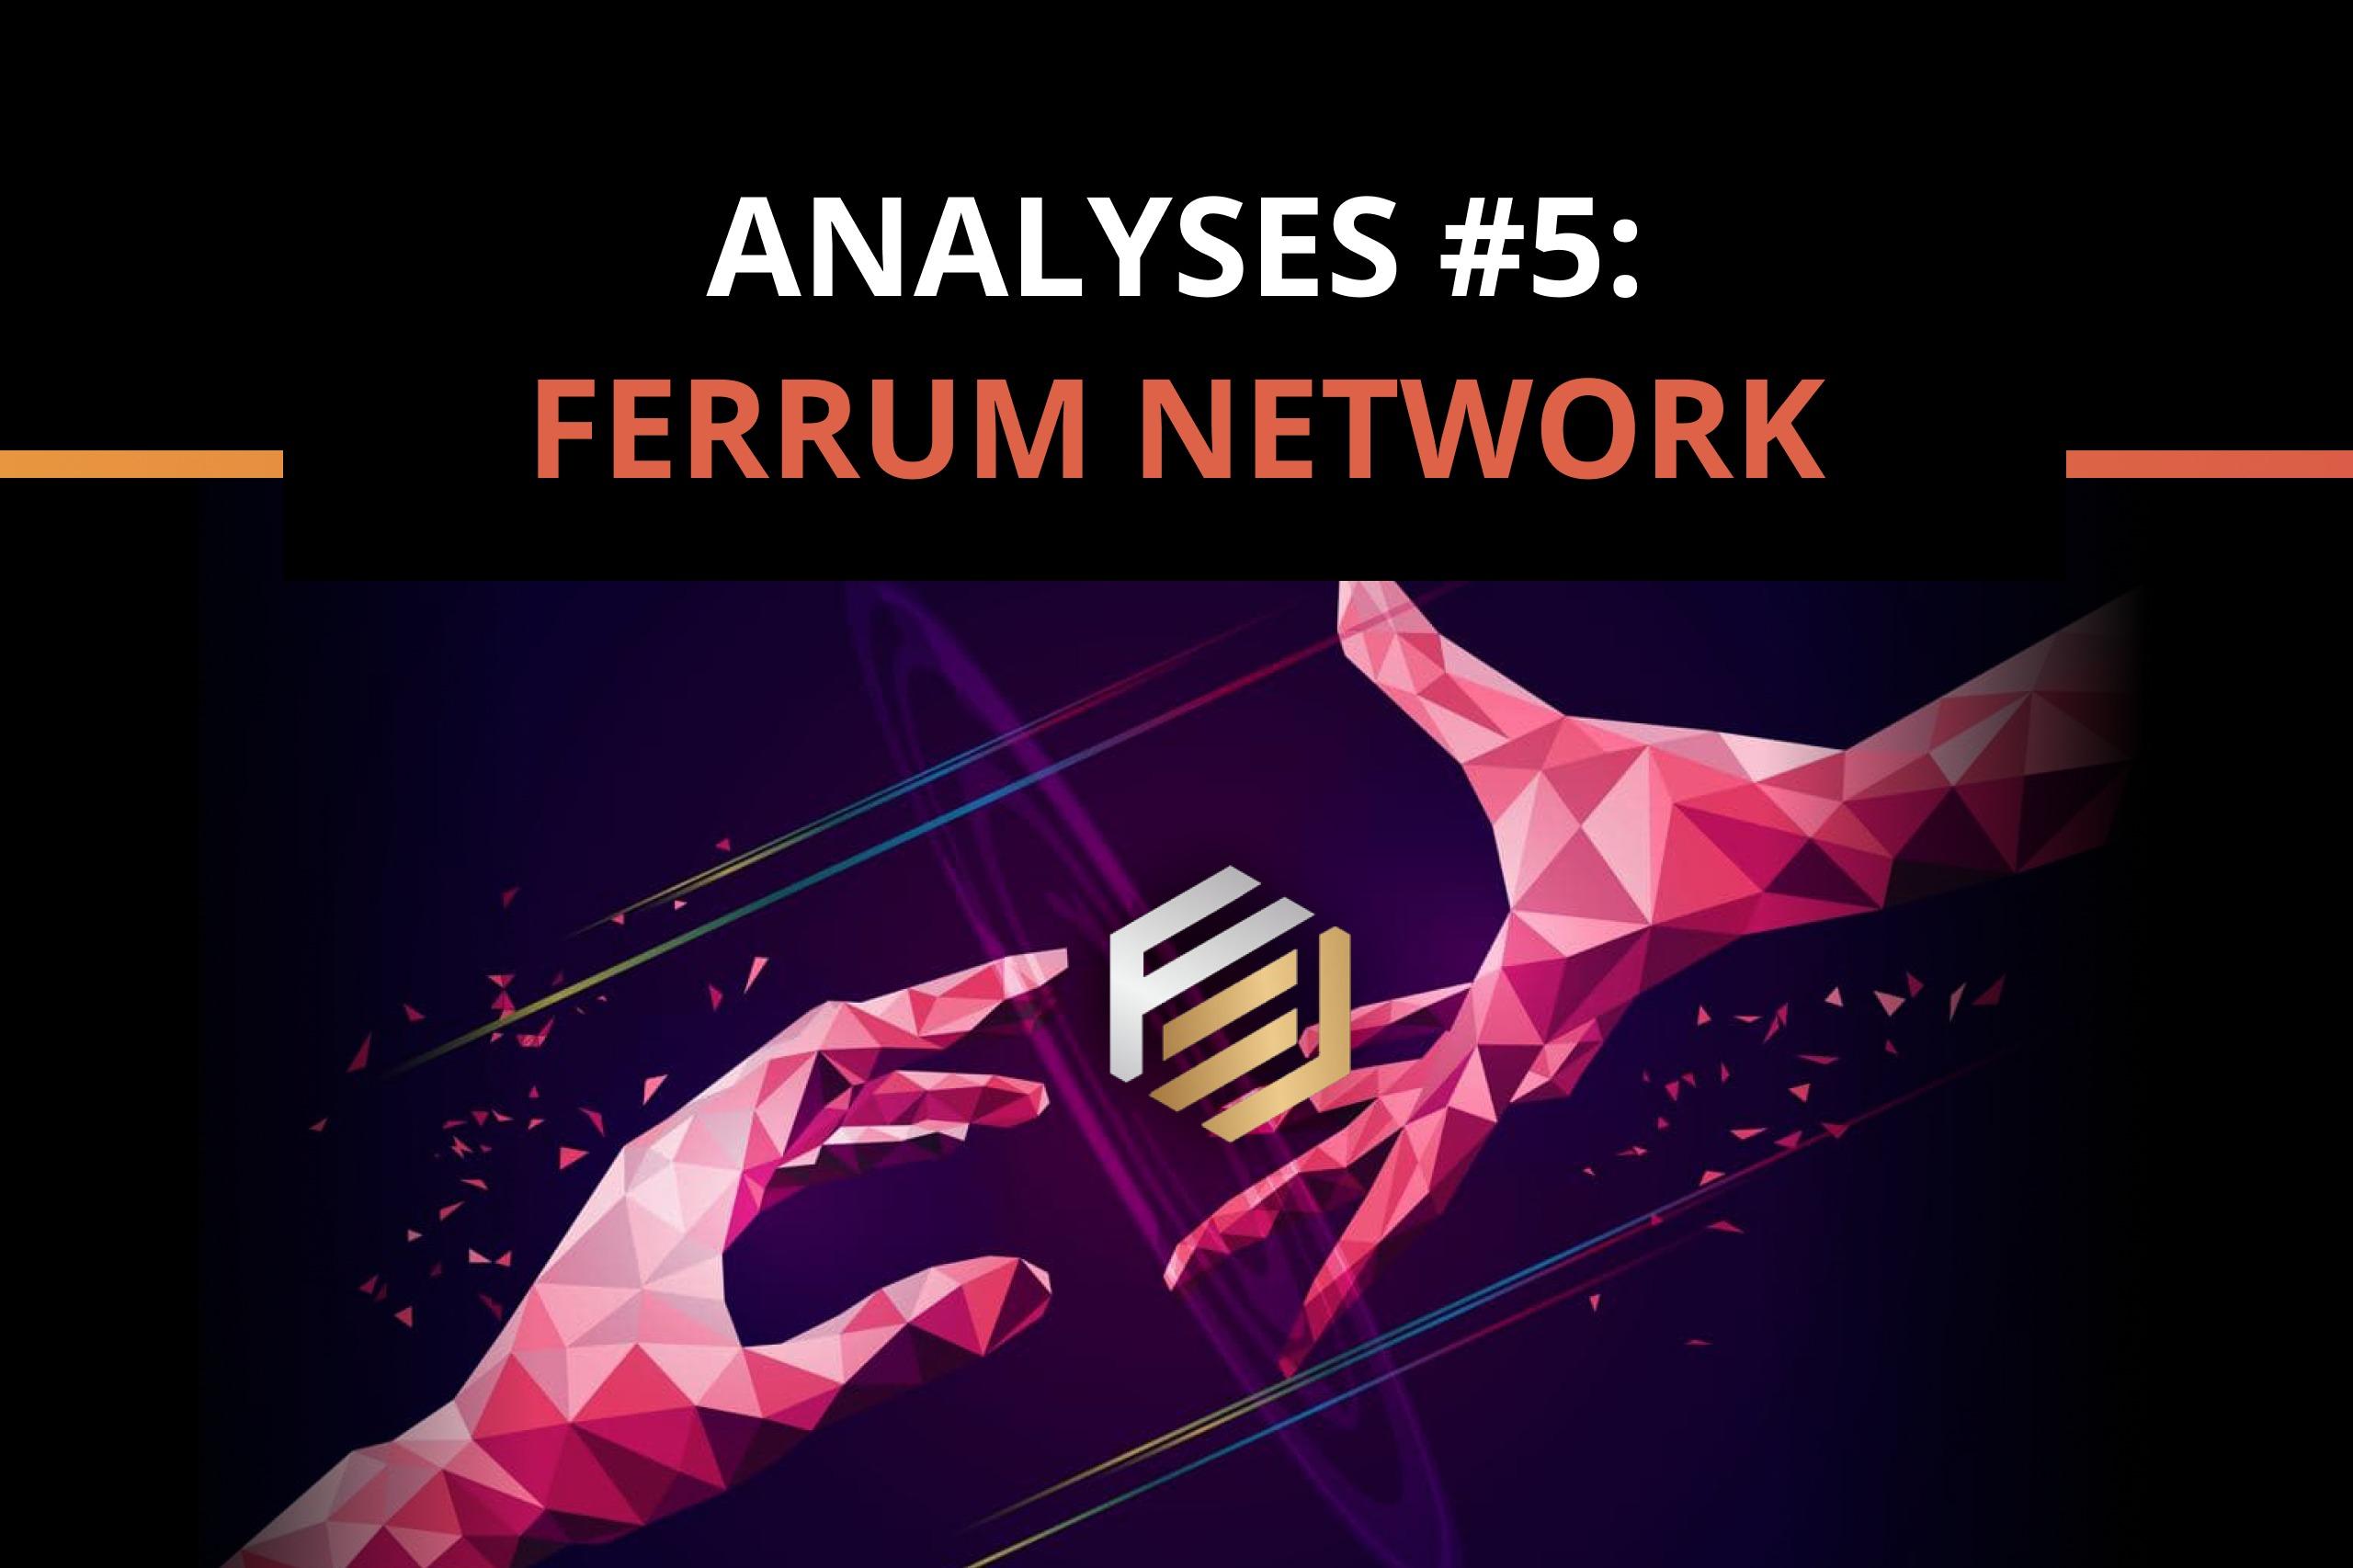 Ferrum Network – The Defi Ecosystem That Interoperates Across Chains